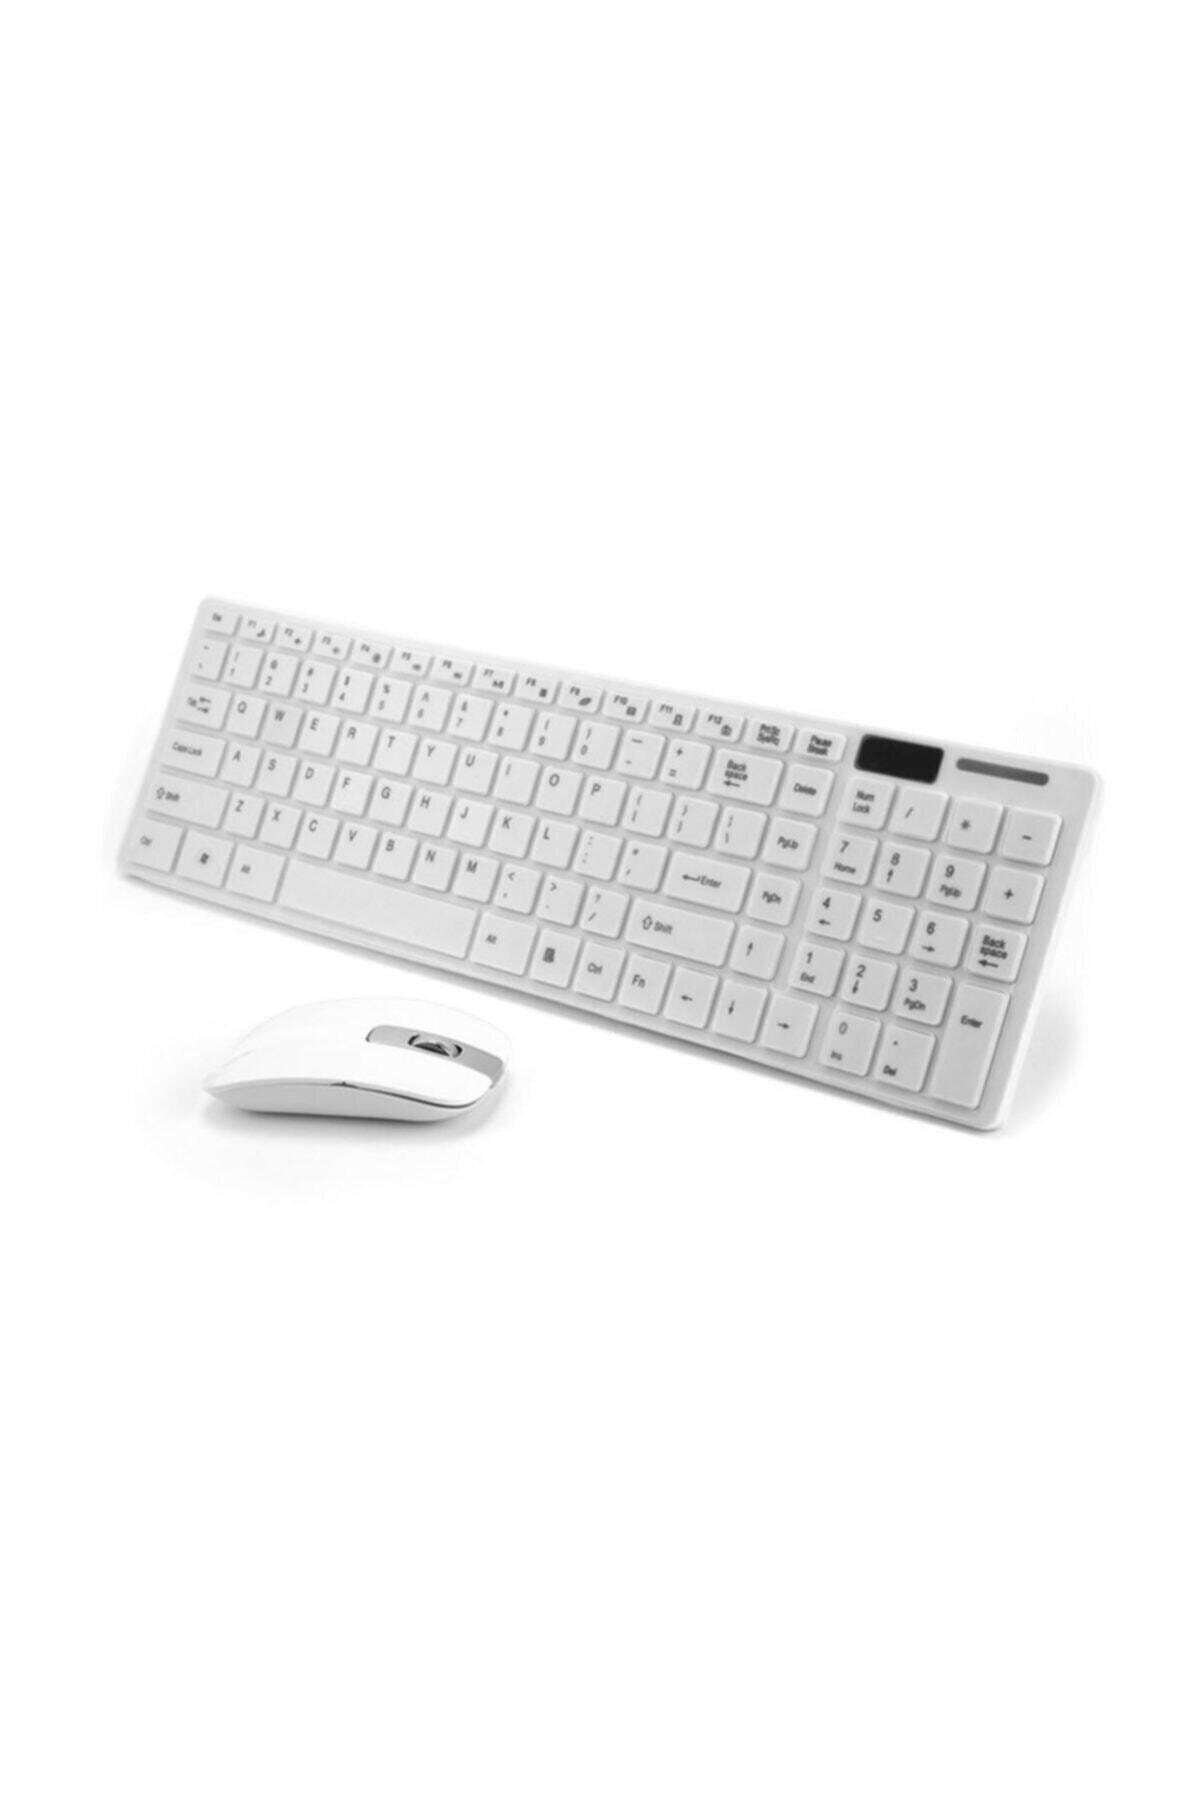 Platoon Klavye Mouse Set Wireless Ultra Ince Beyaz Pl-374 1